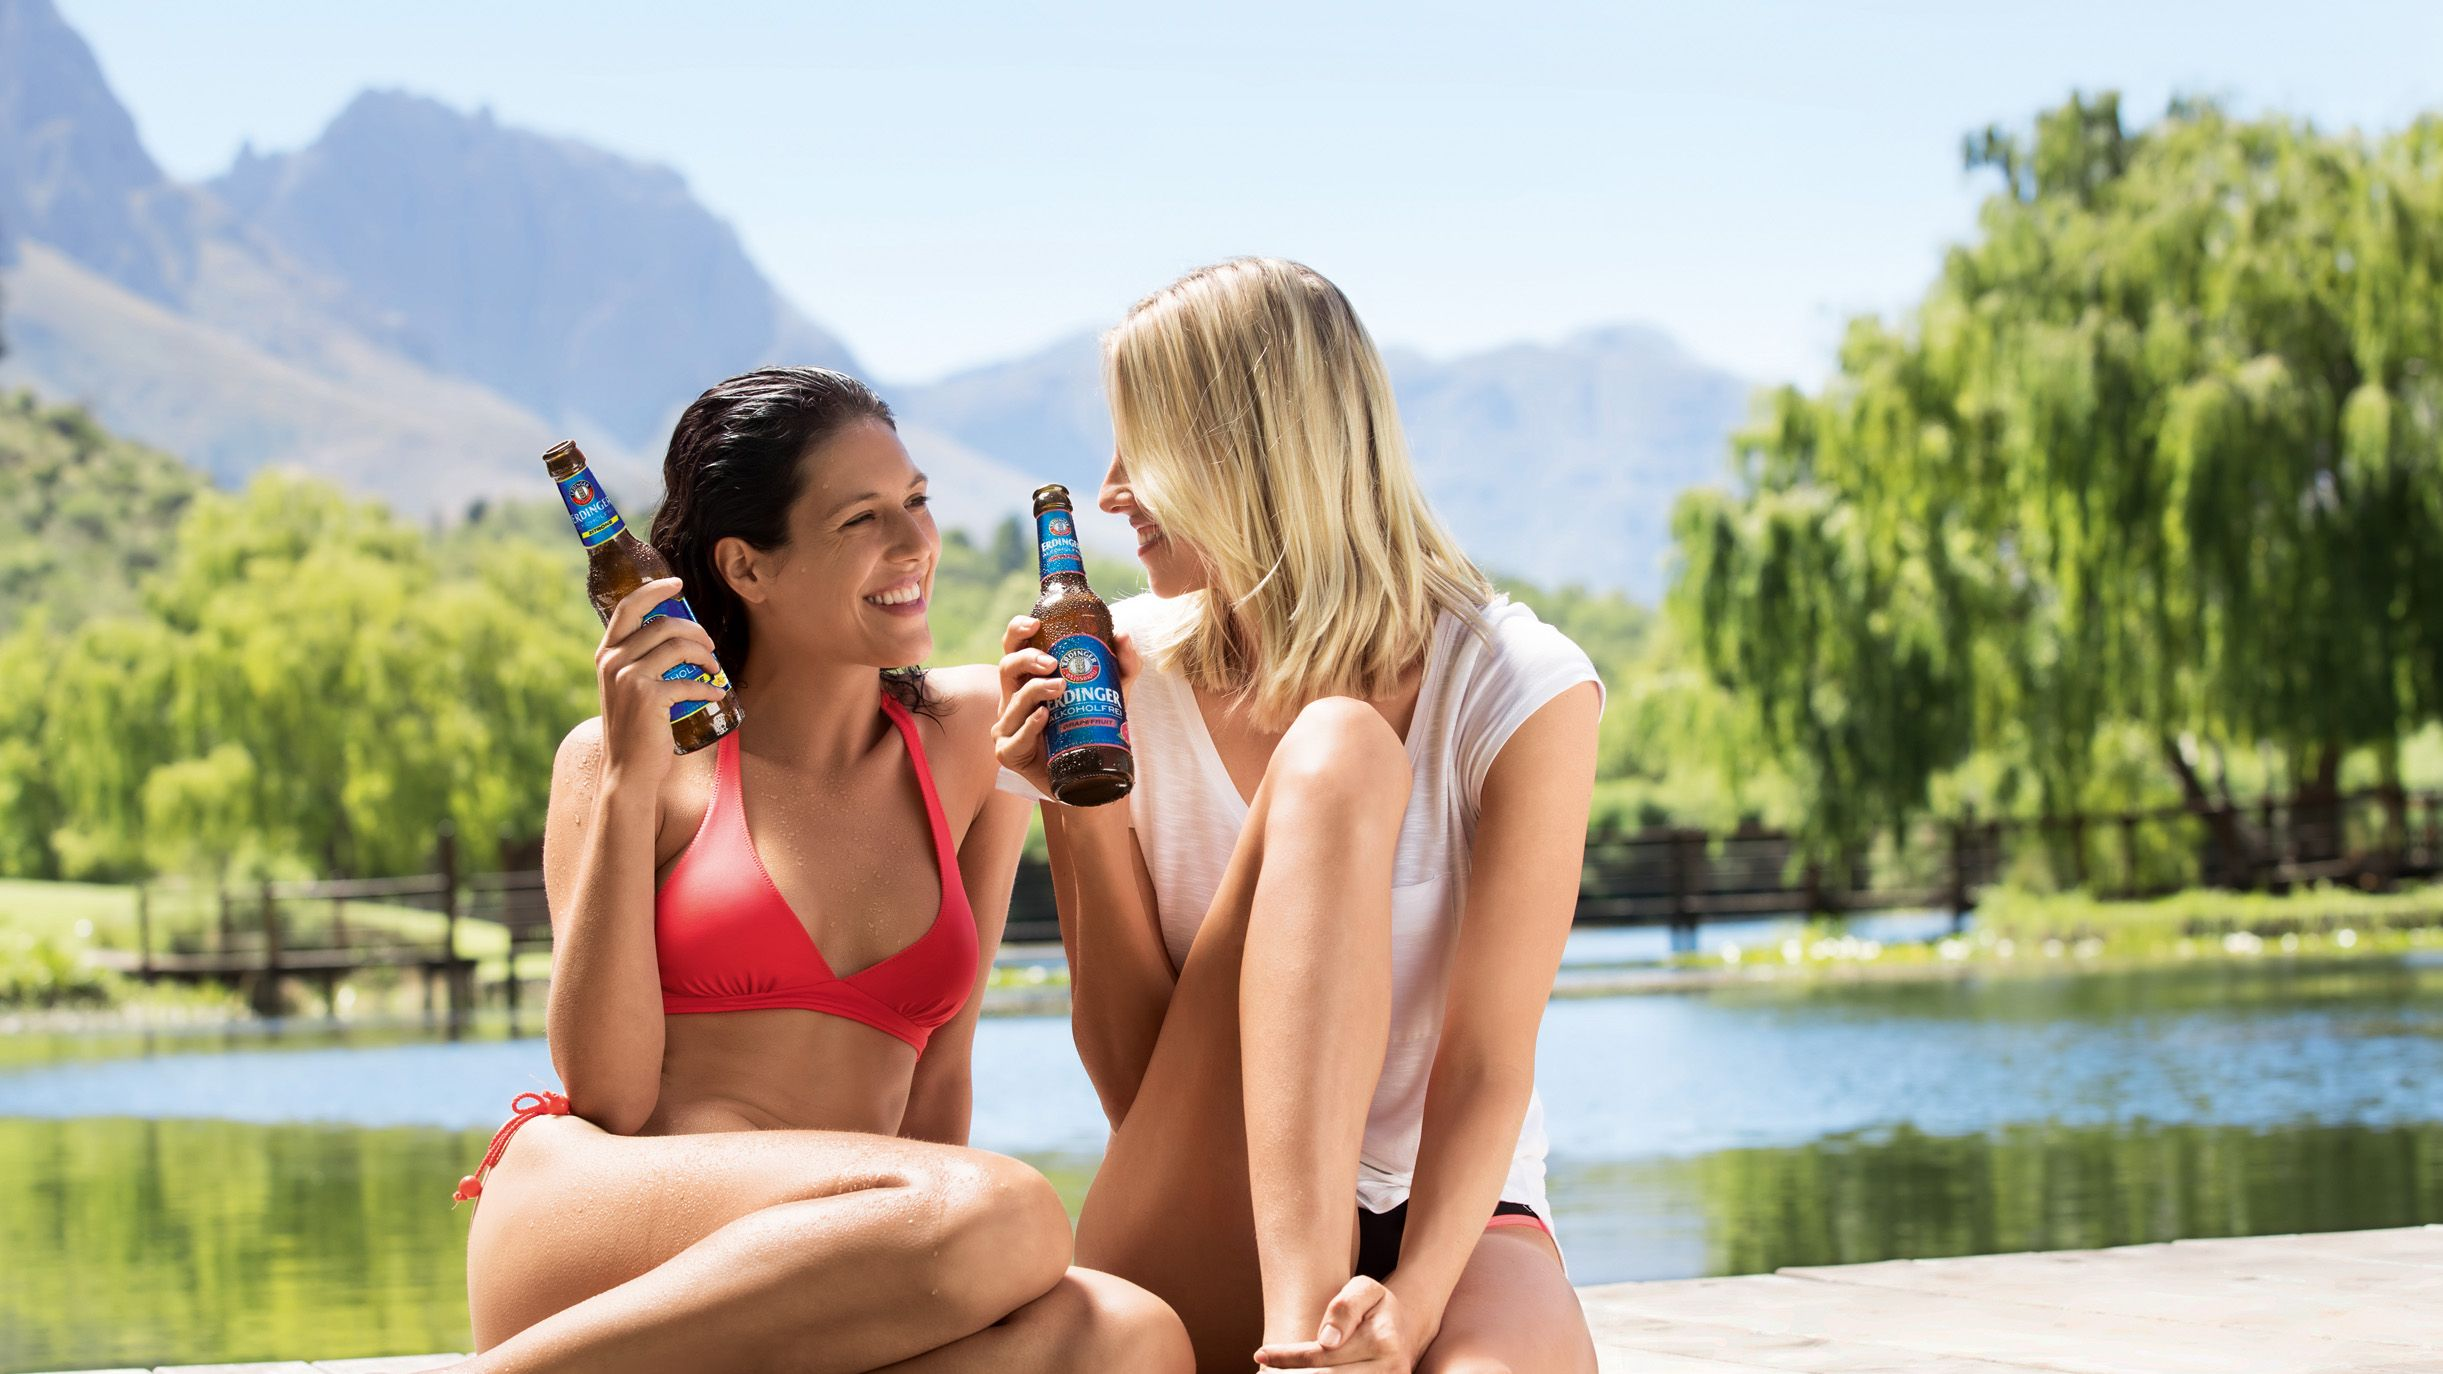 Die beliebtesten Biermarken: Erdinger kommt im Social Web am besten weg, Krombacher am schlechtesten